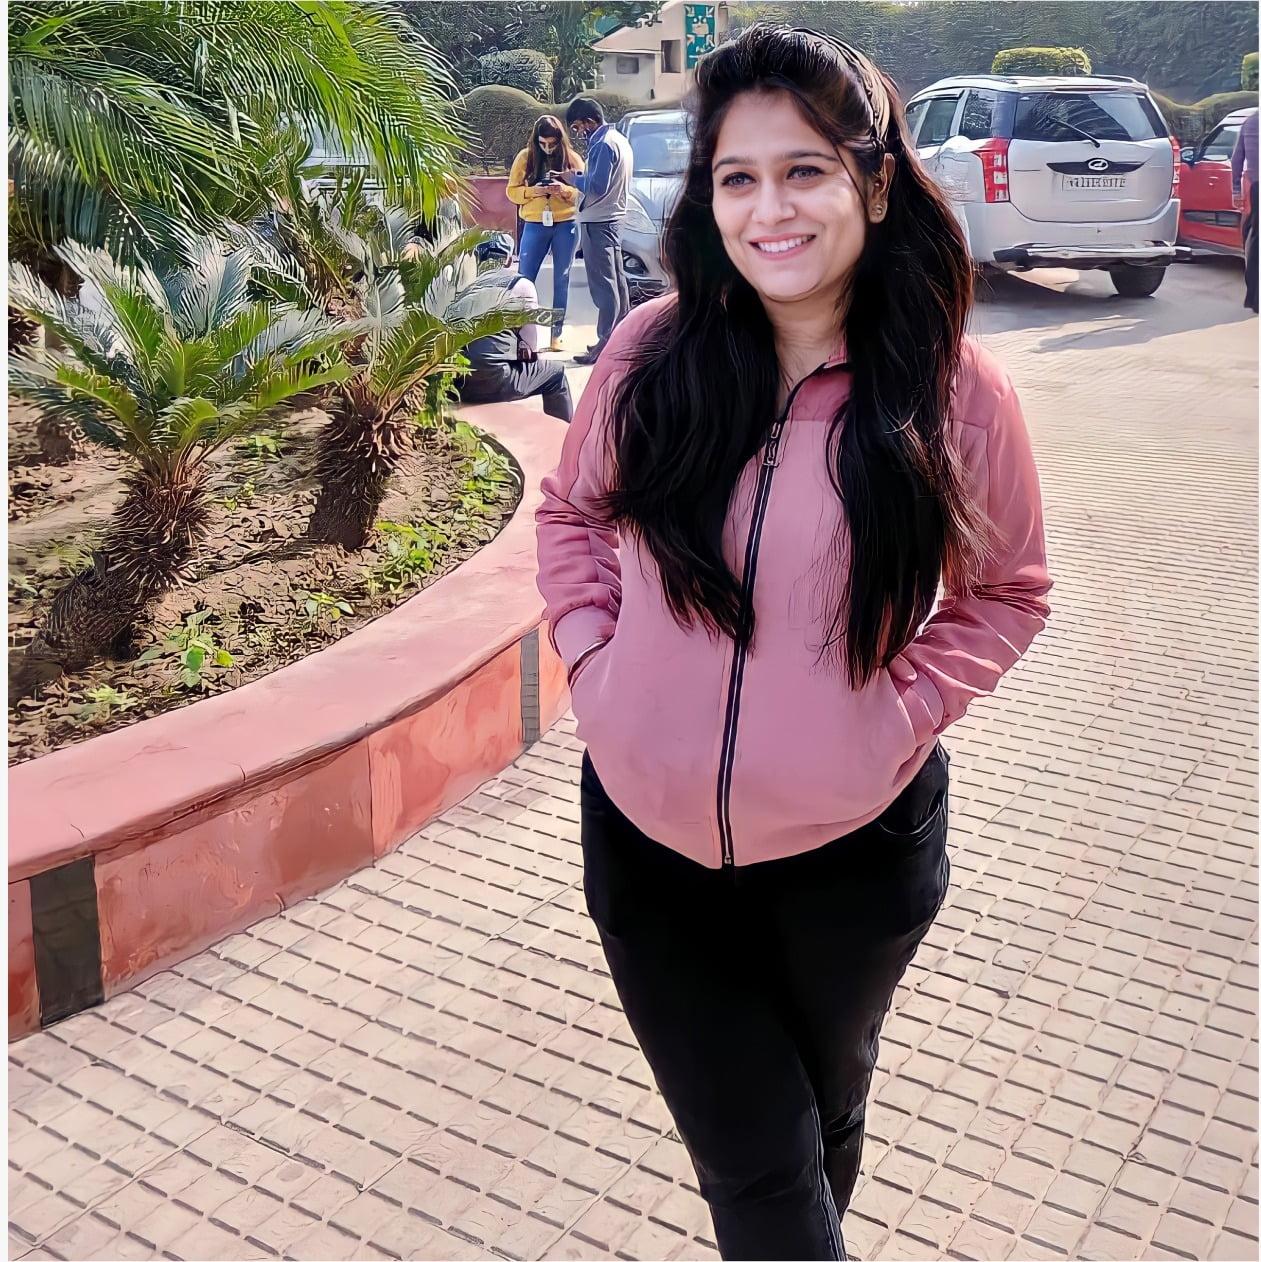 Bhawna Khanduja